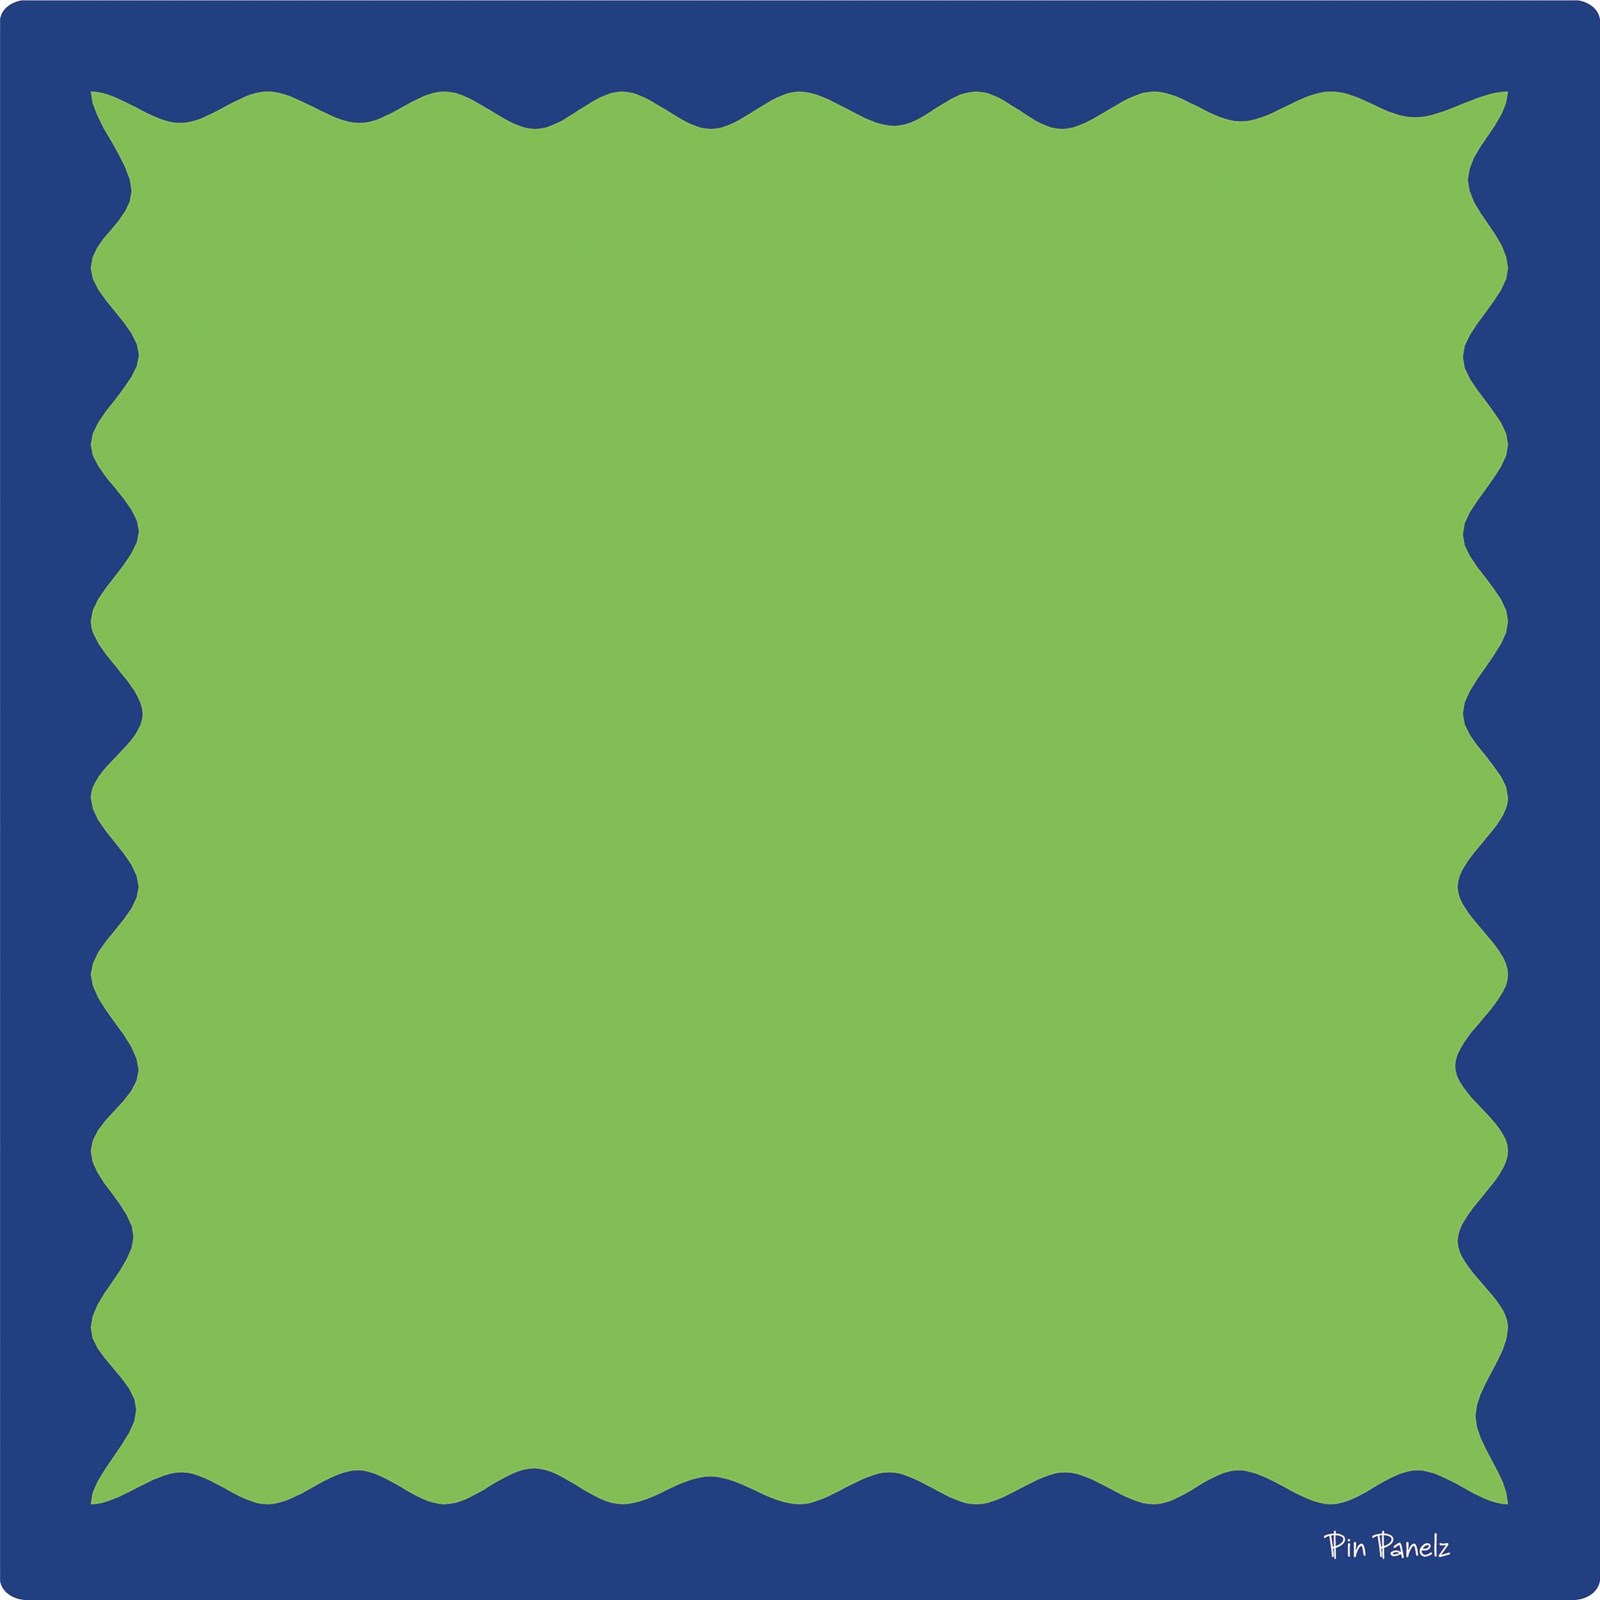 Funky Pin Panelz Navy/Green - W900 x H900mm